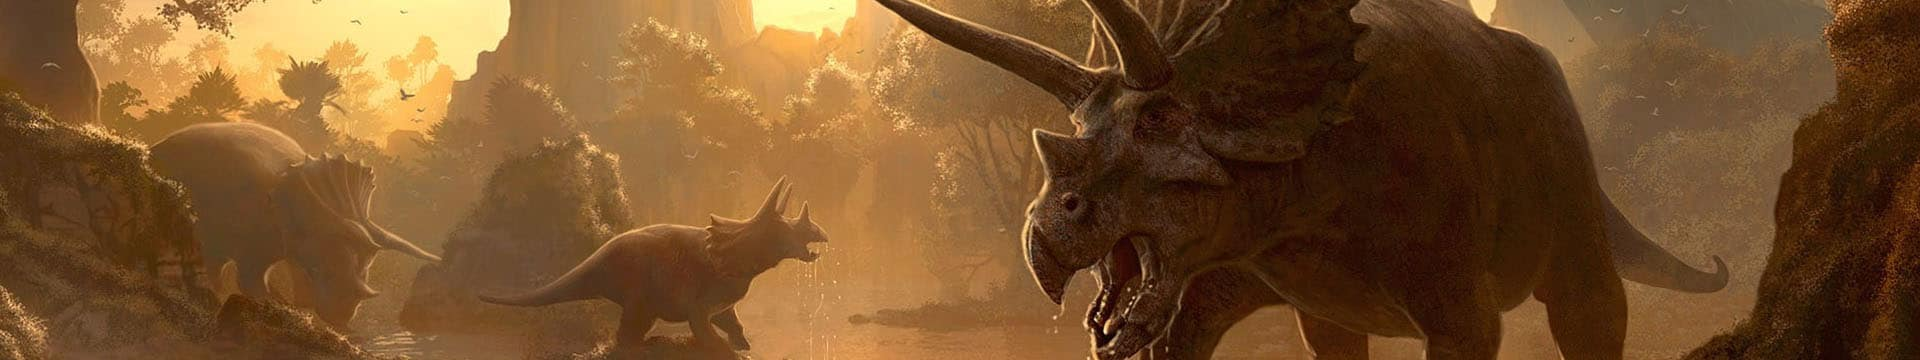 5 Dino-Sized Reasons Why We Love Jurassic World's Killer Website